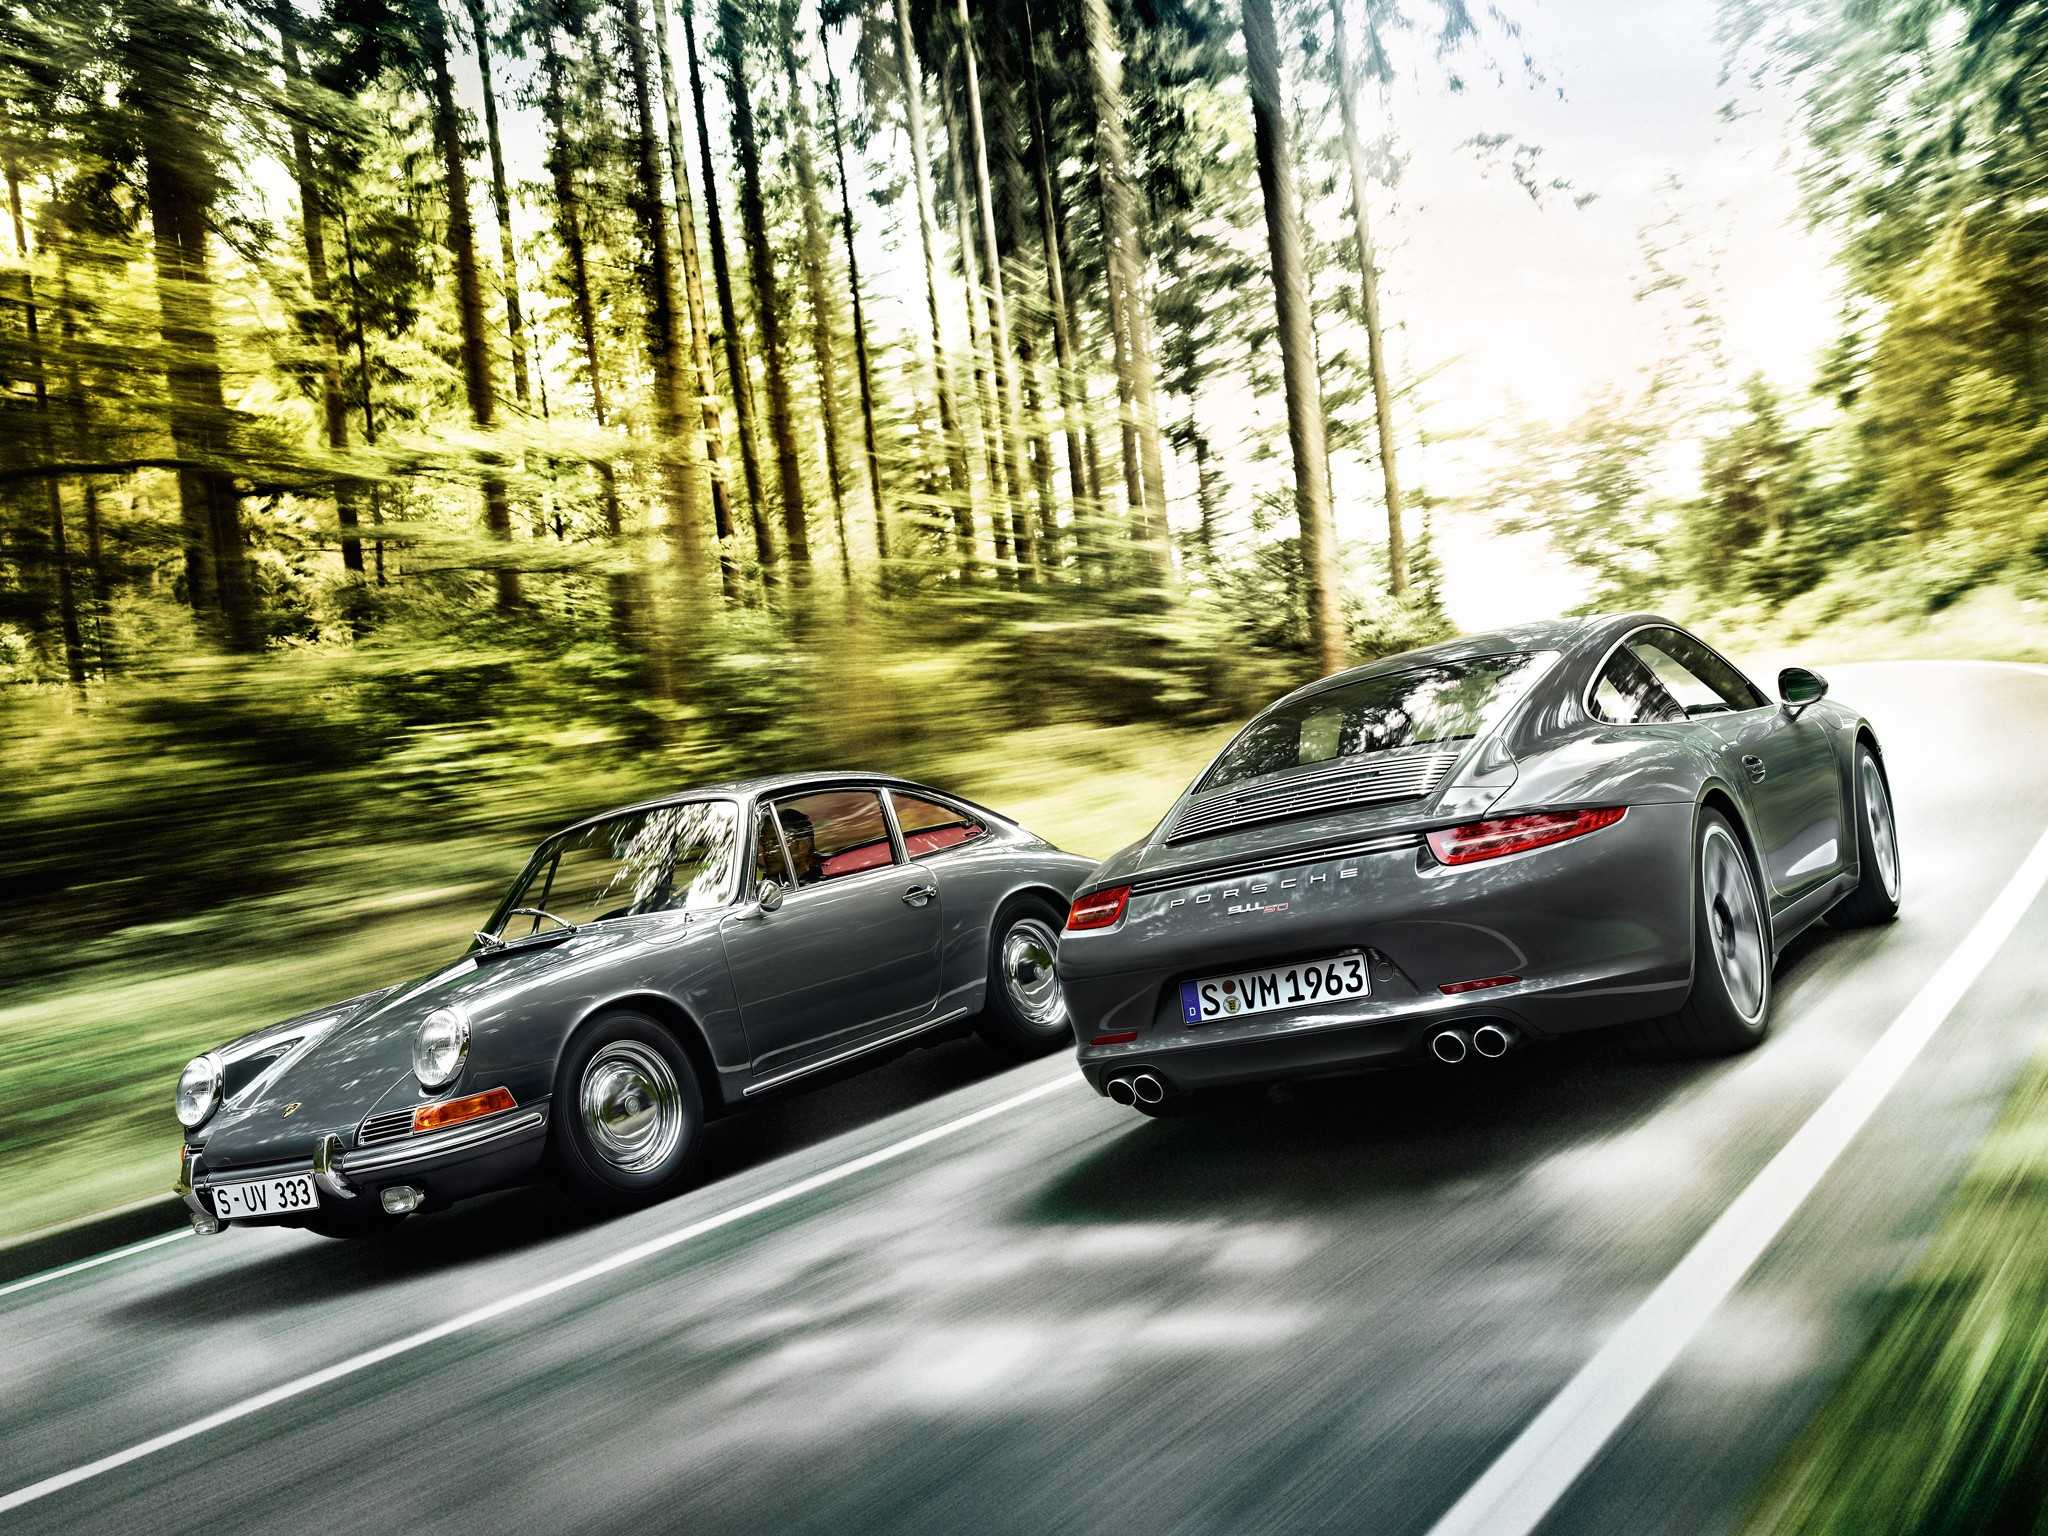 Ferdinand Alexander Butzi Porsche on who invented the porsche, dzhokhar tsarnaev porsche, alex porsche,